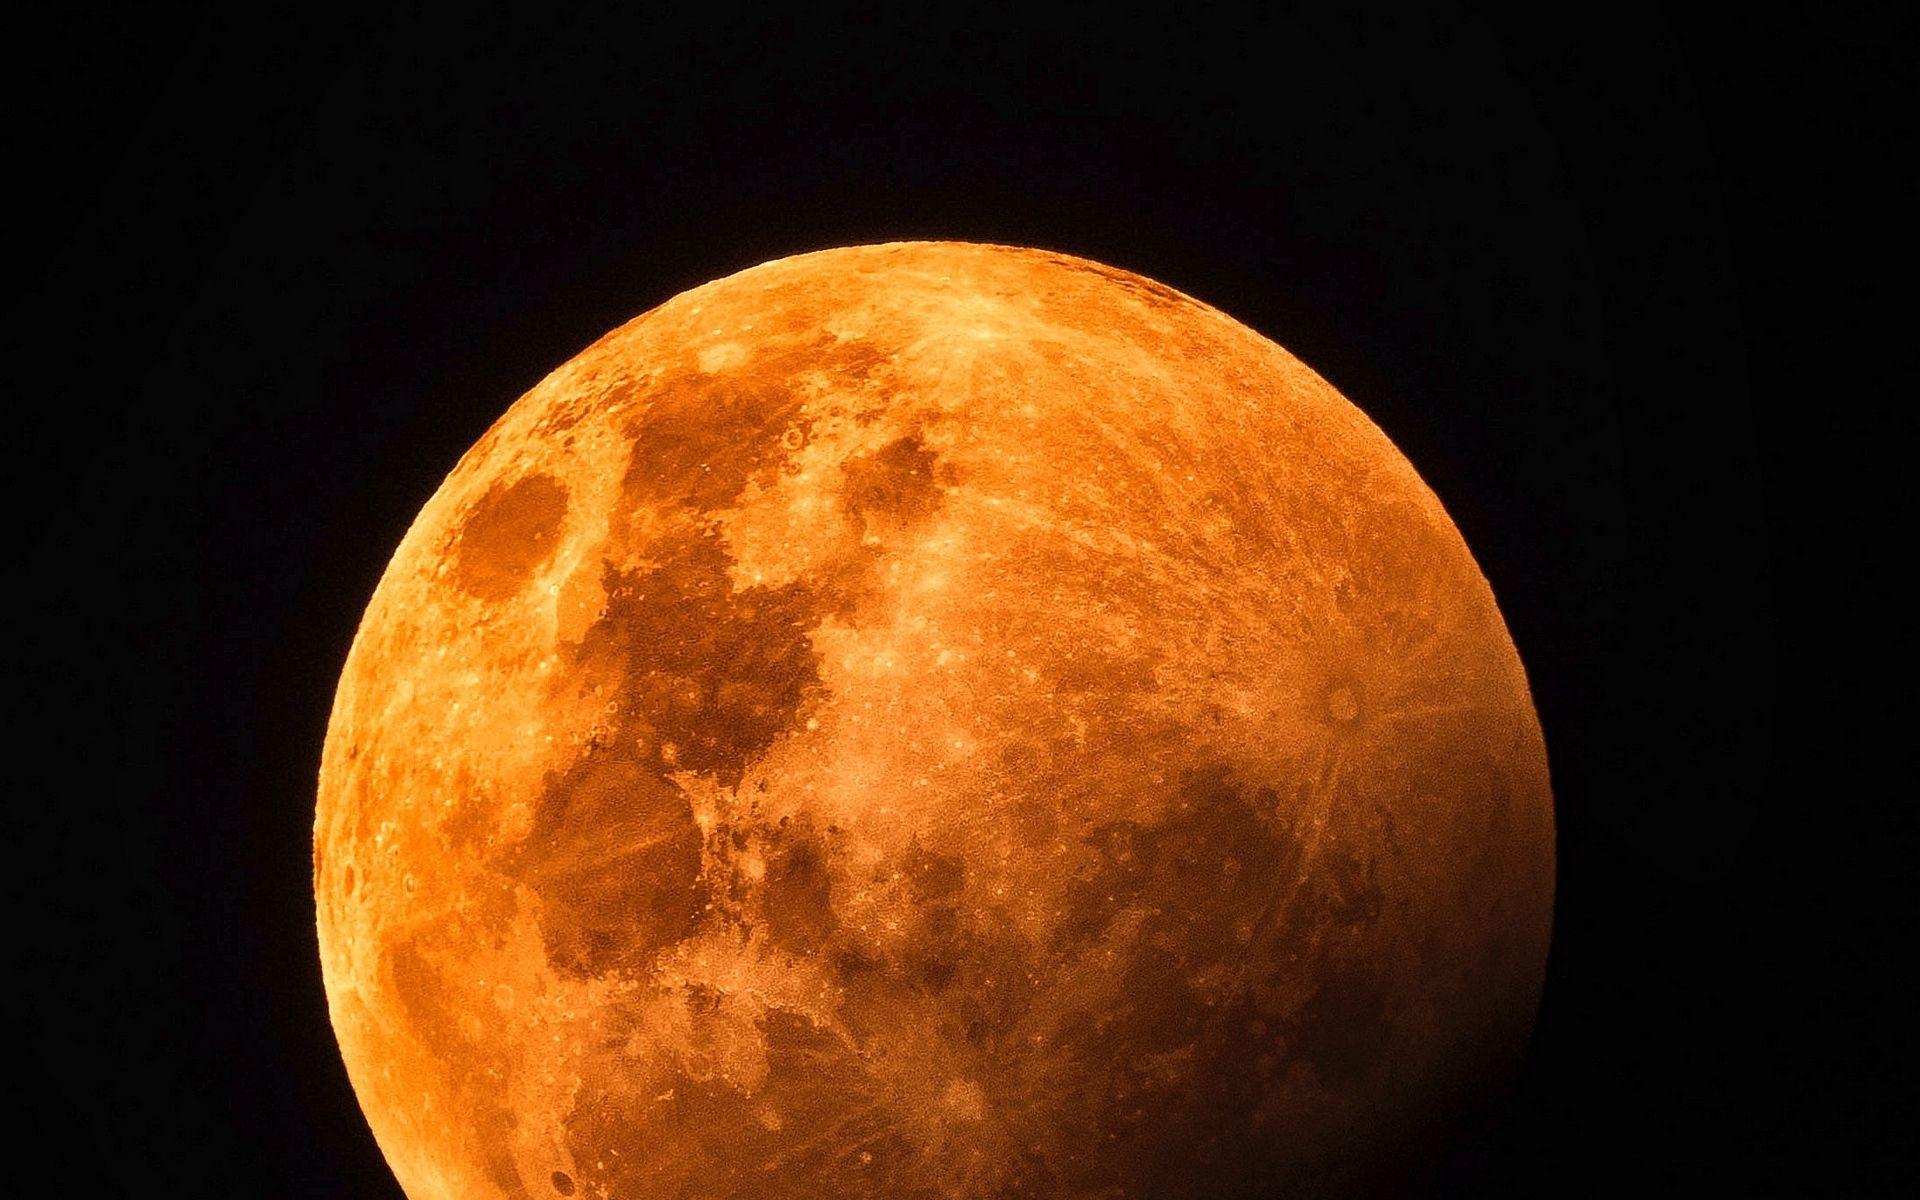 Orange Moon Wallpaper Hd Orange Moon Red Moon Wallpaper